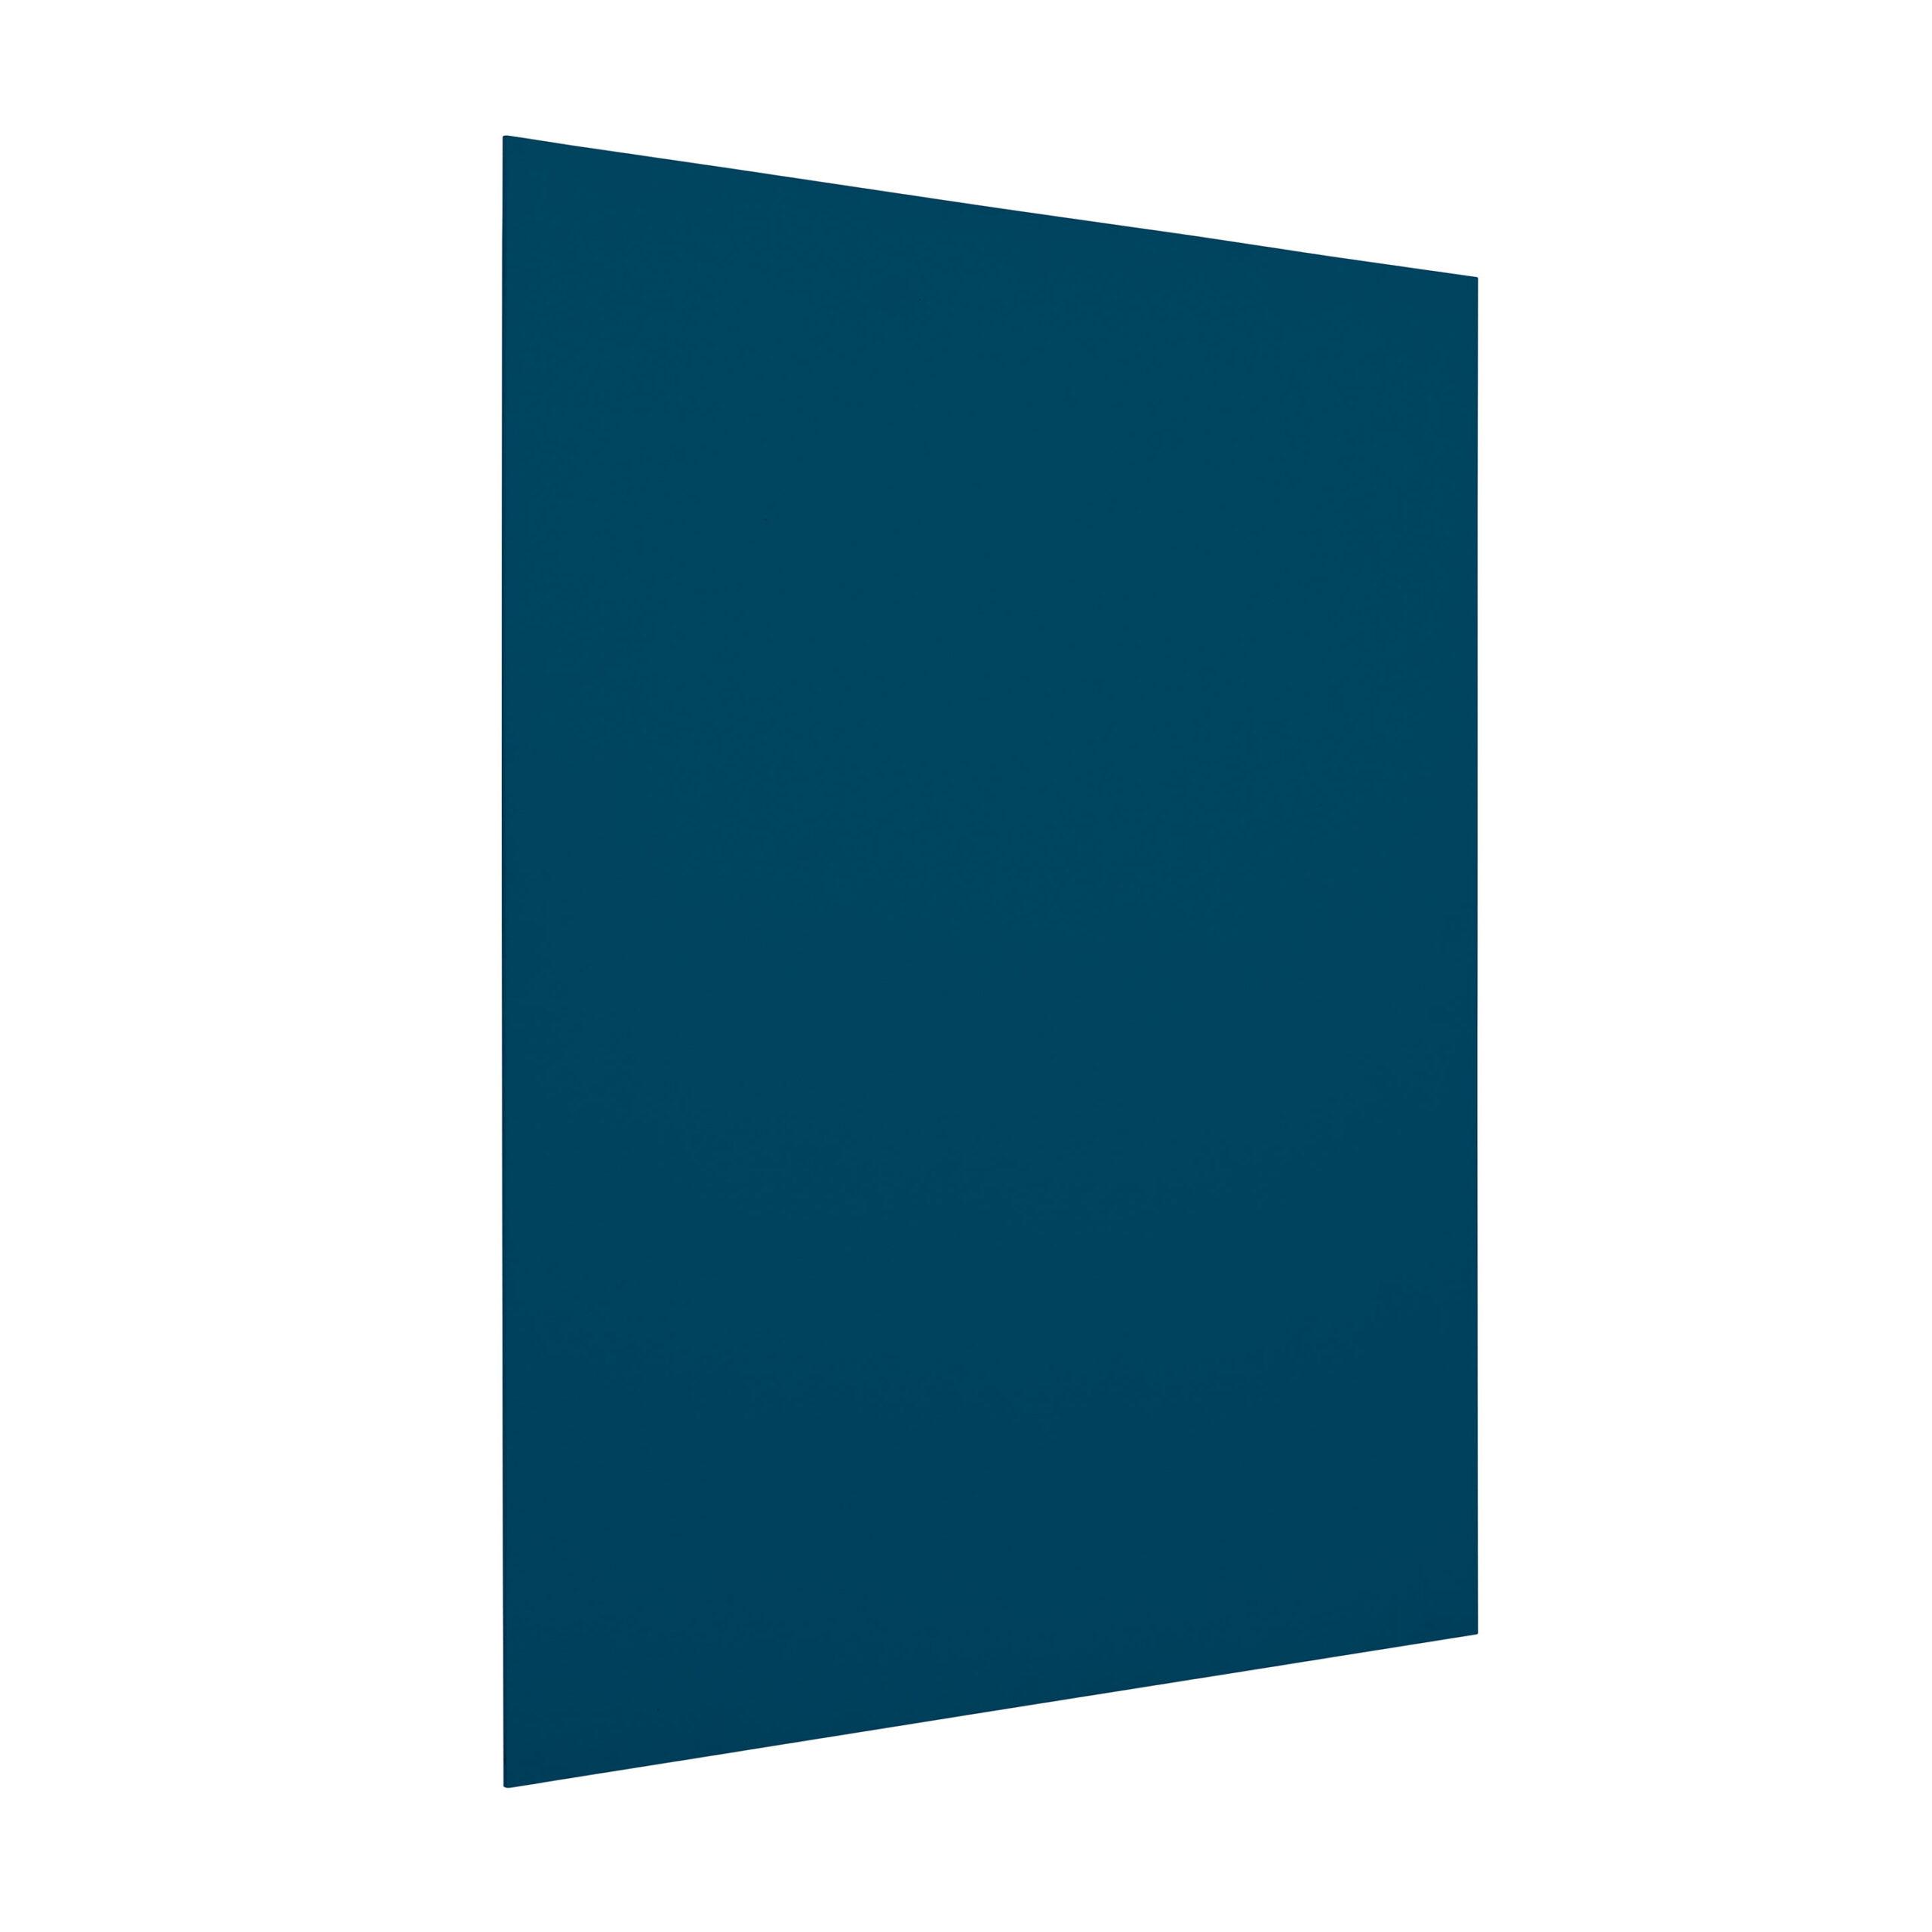 Space-Bulletin-Board_06